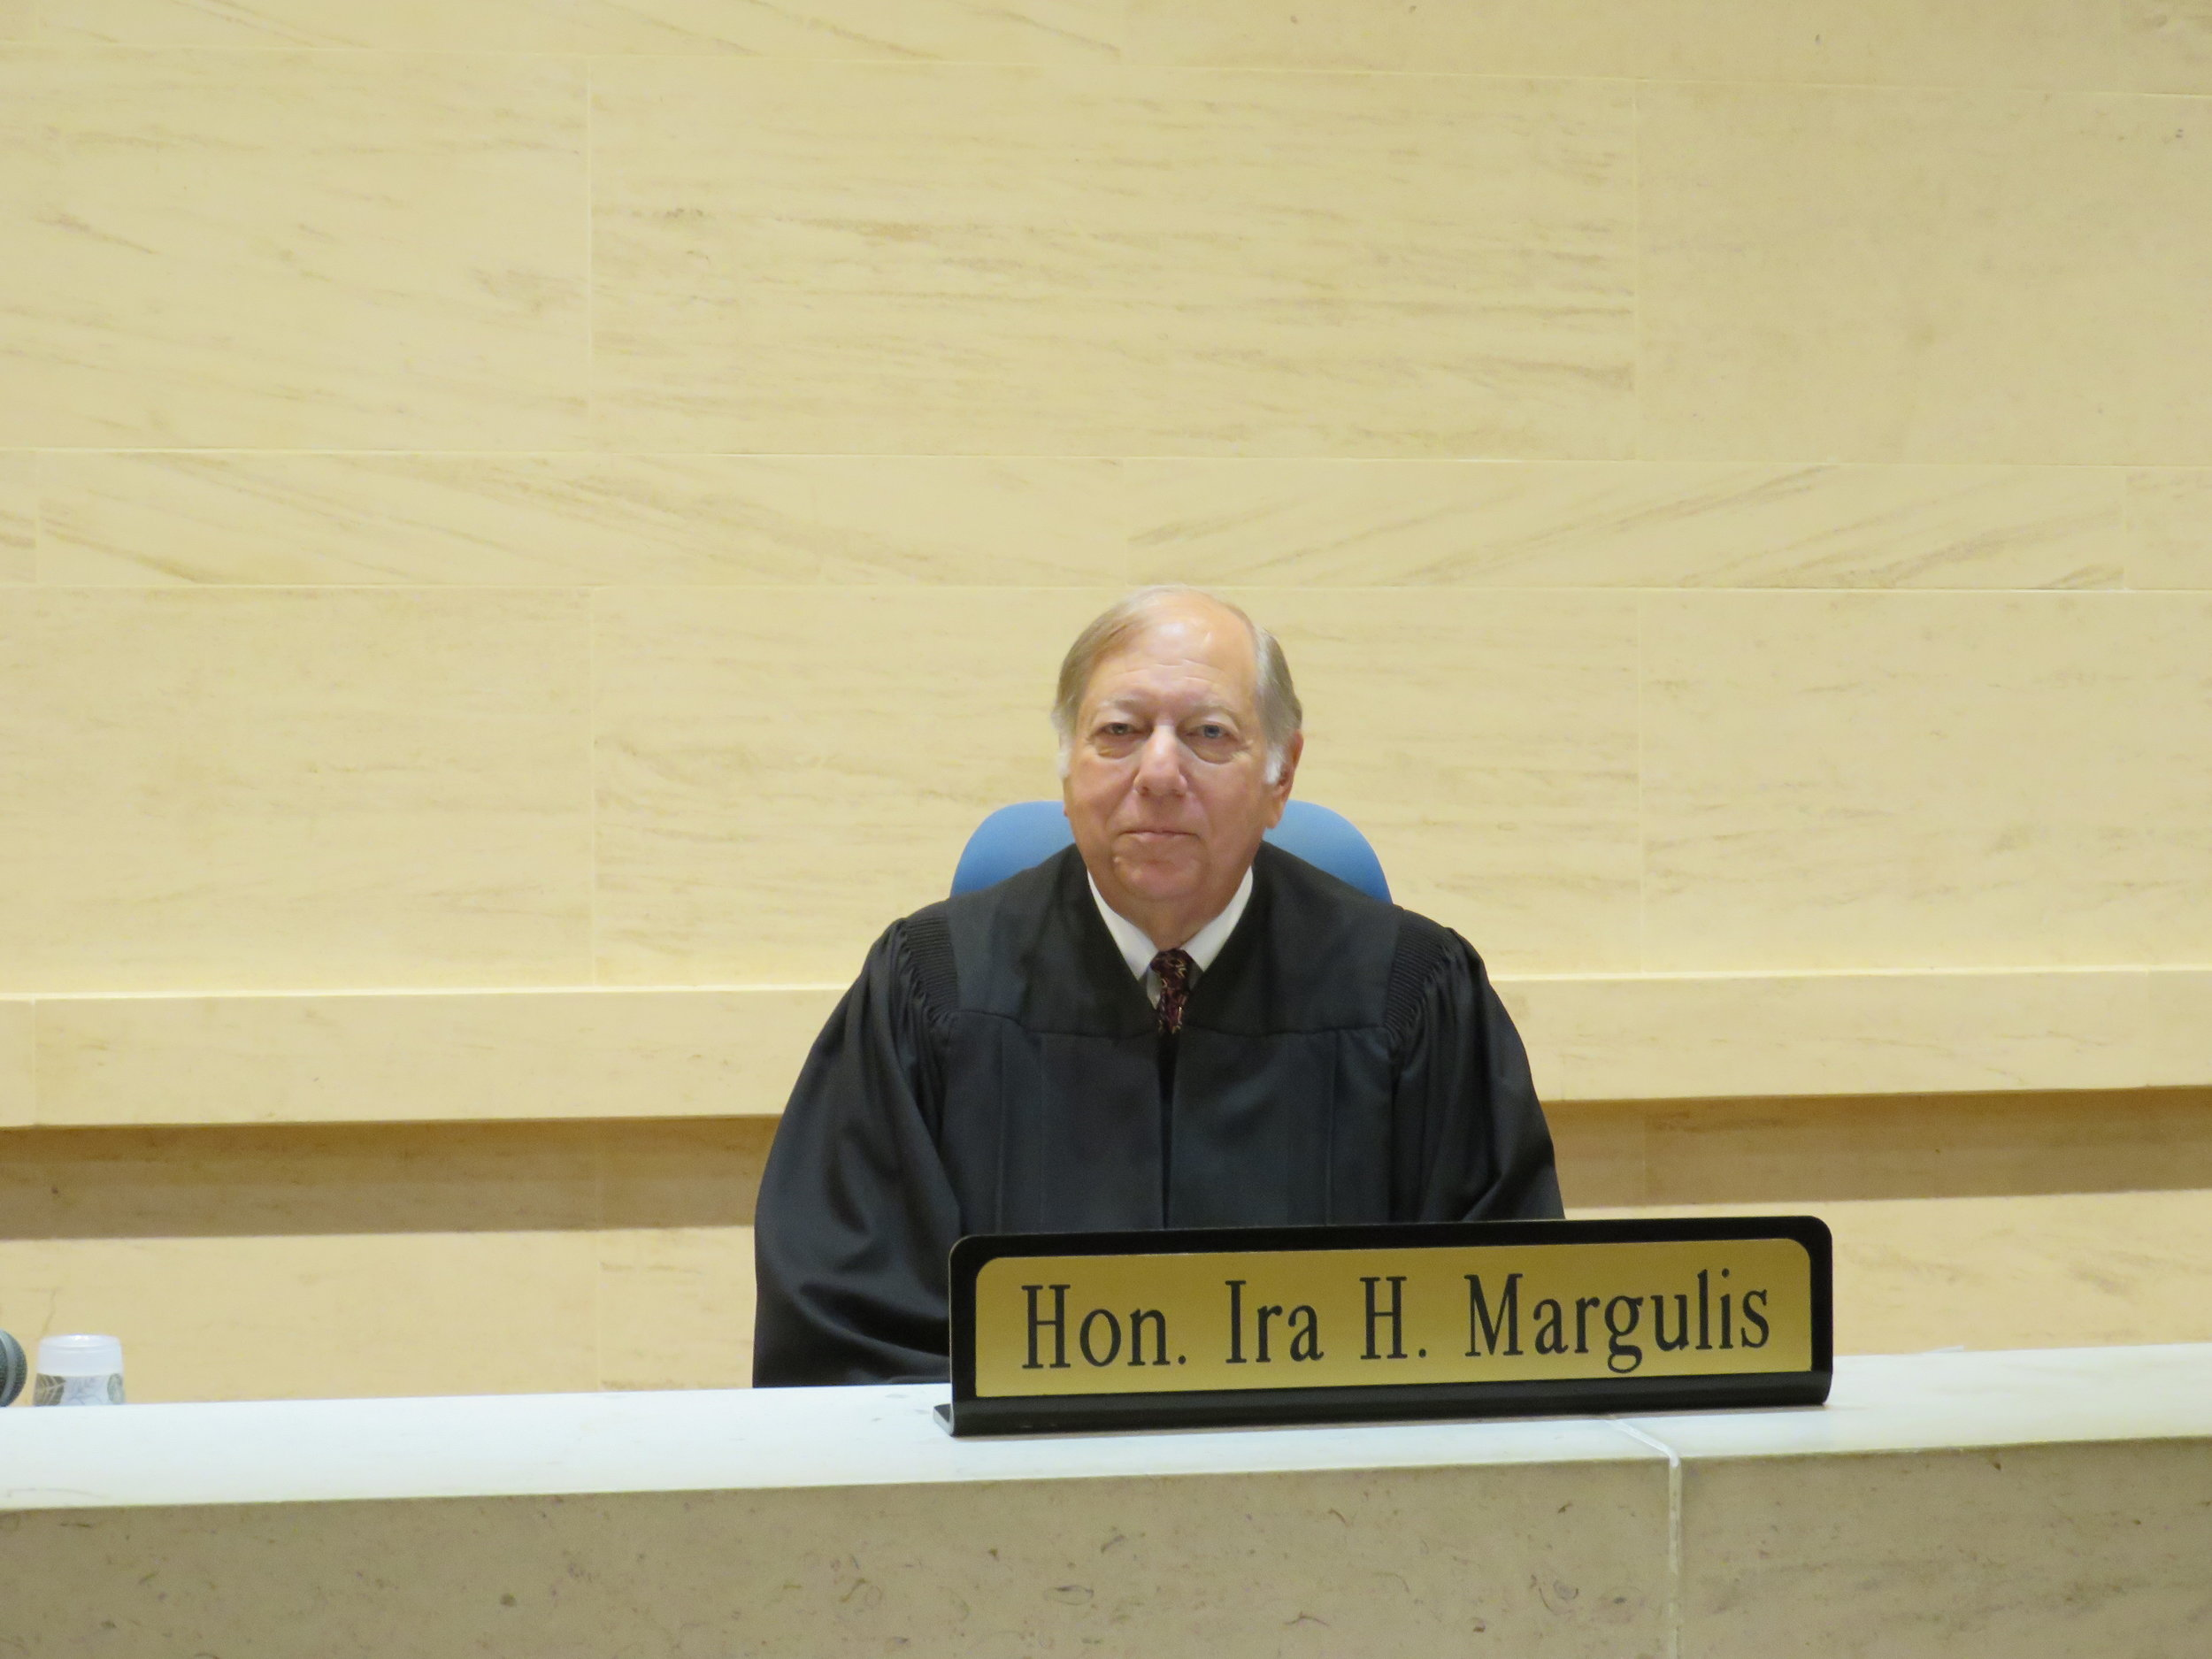 Judge Ira Margulis. // Eagle photo by David Brand